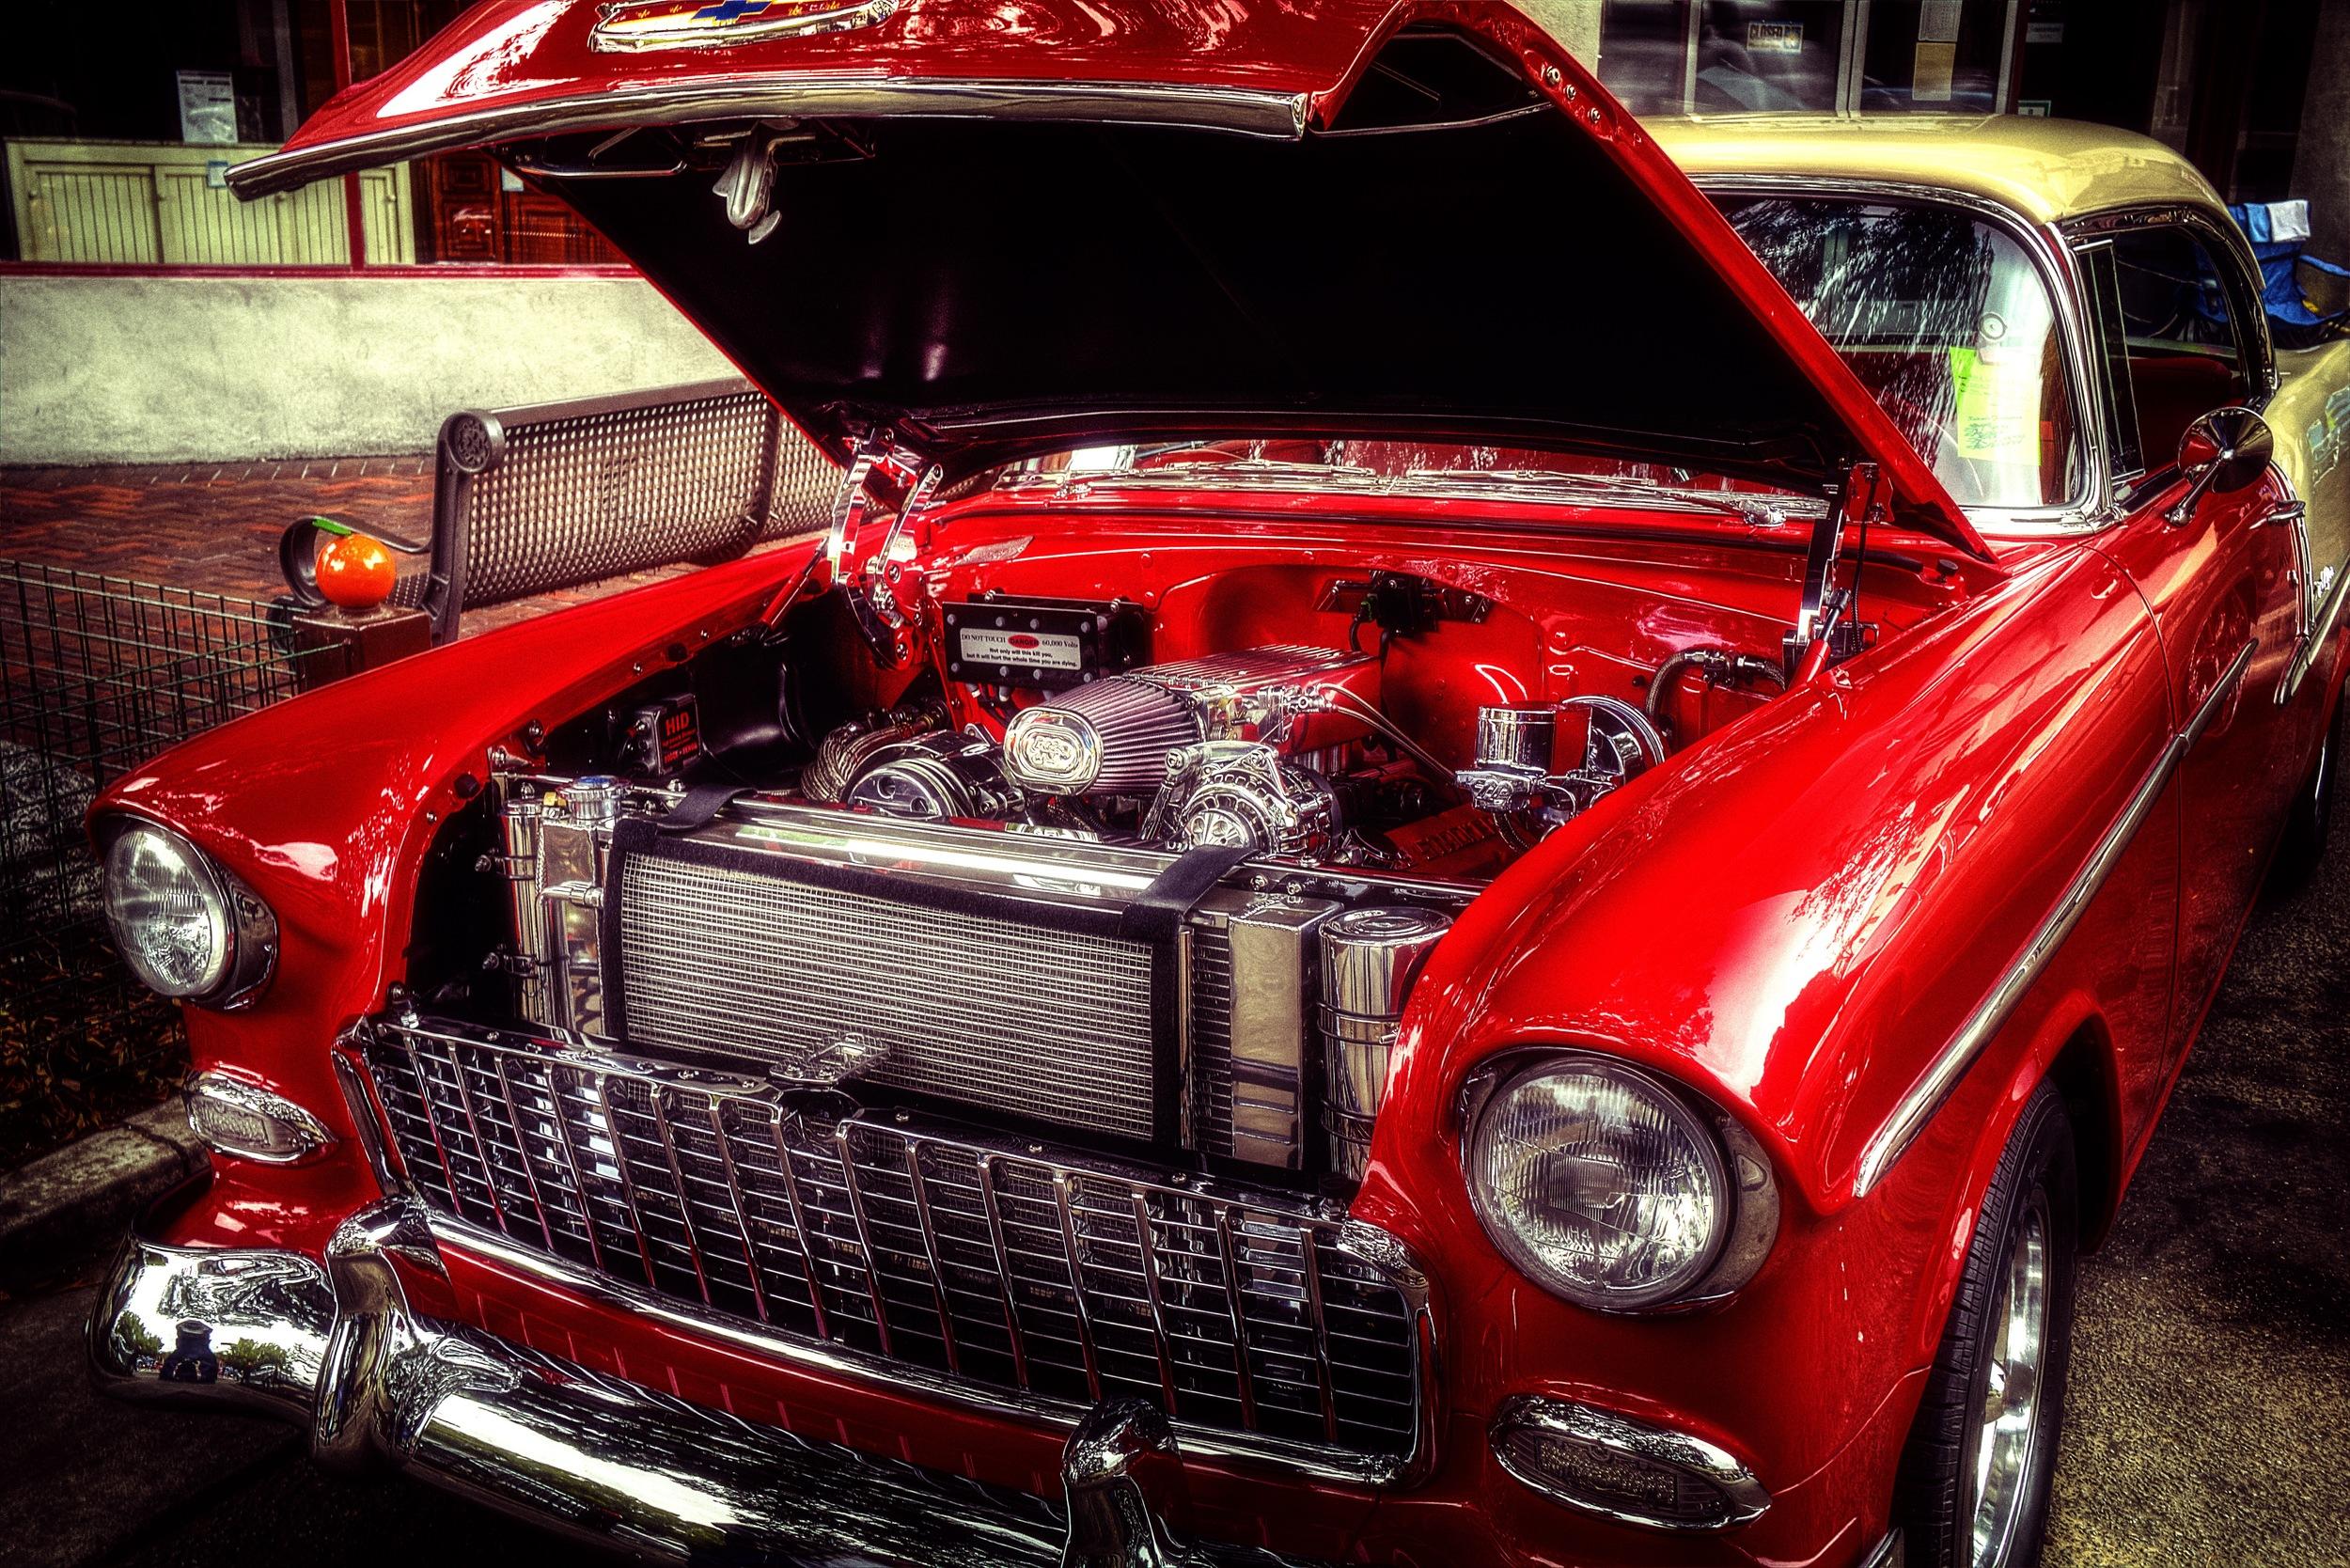 red chevy engine.jpg